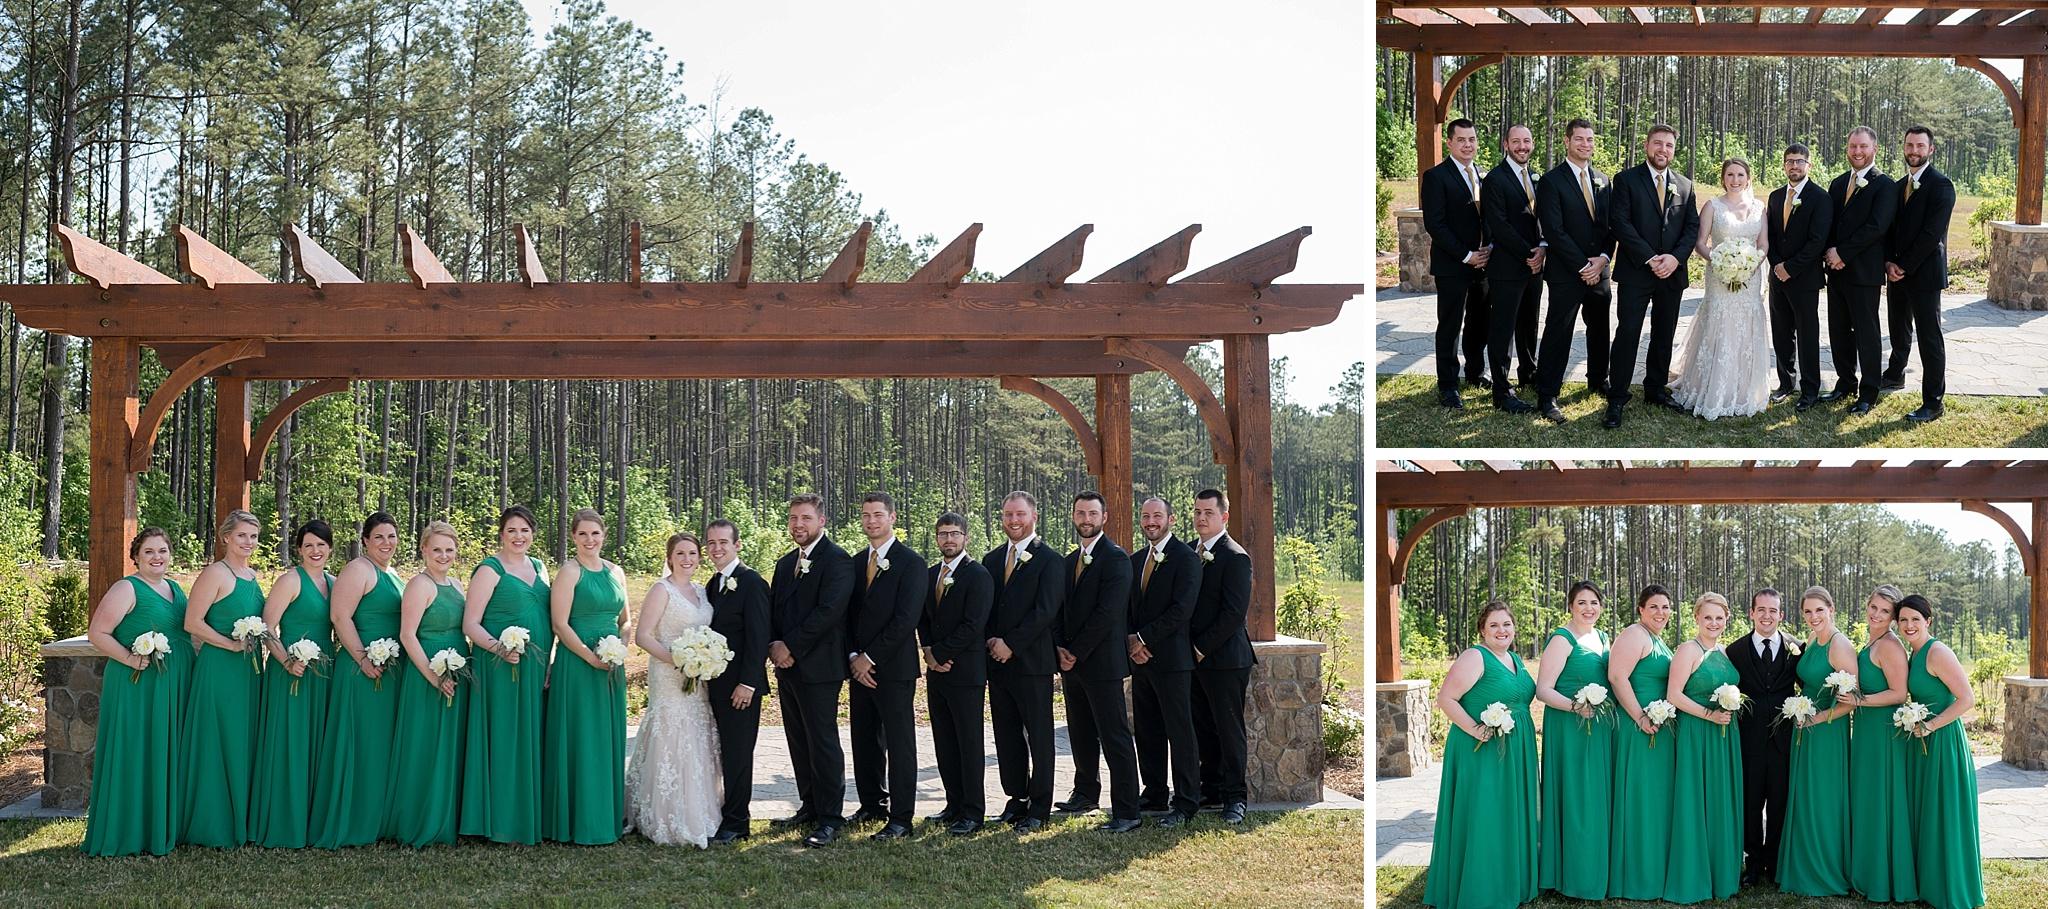 Pavilion-Carriage-Farms-Wedding-Photographer-194.jpg